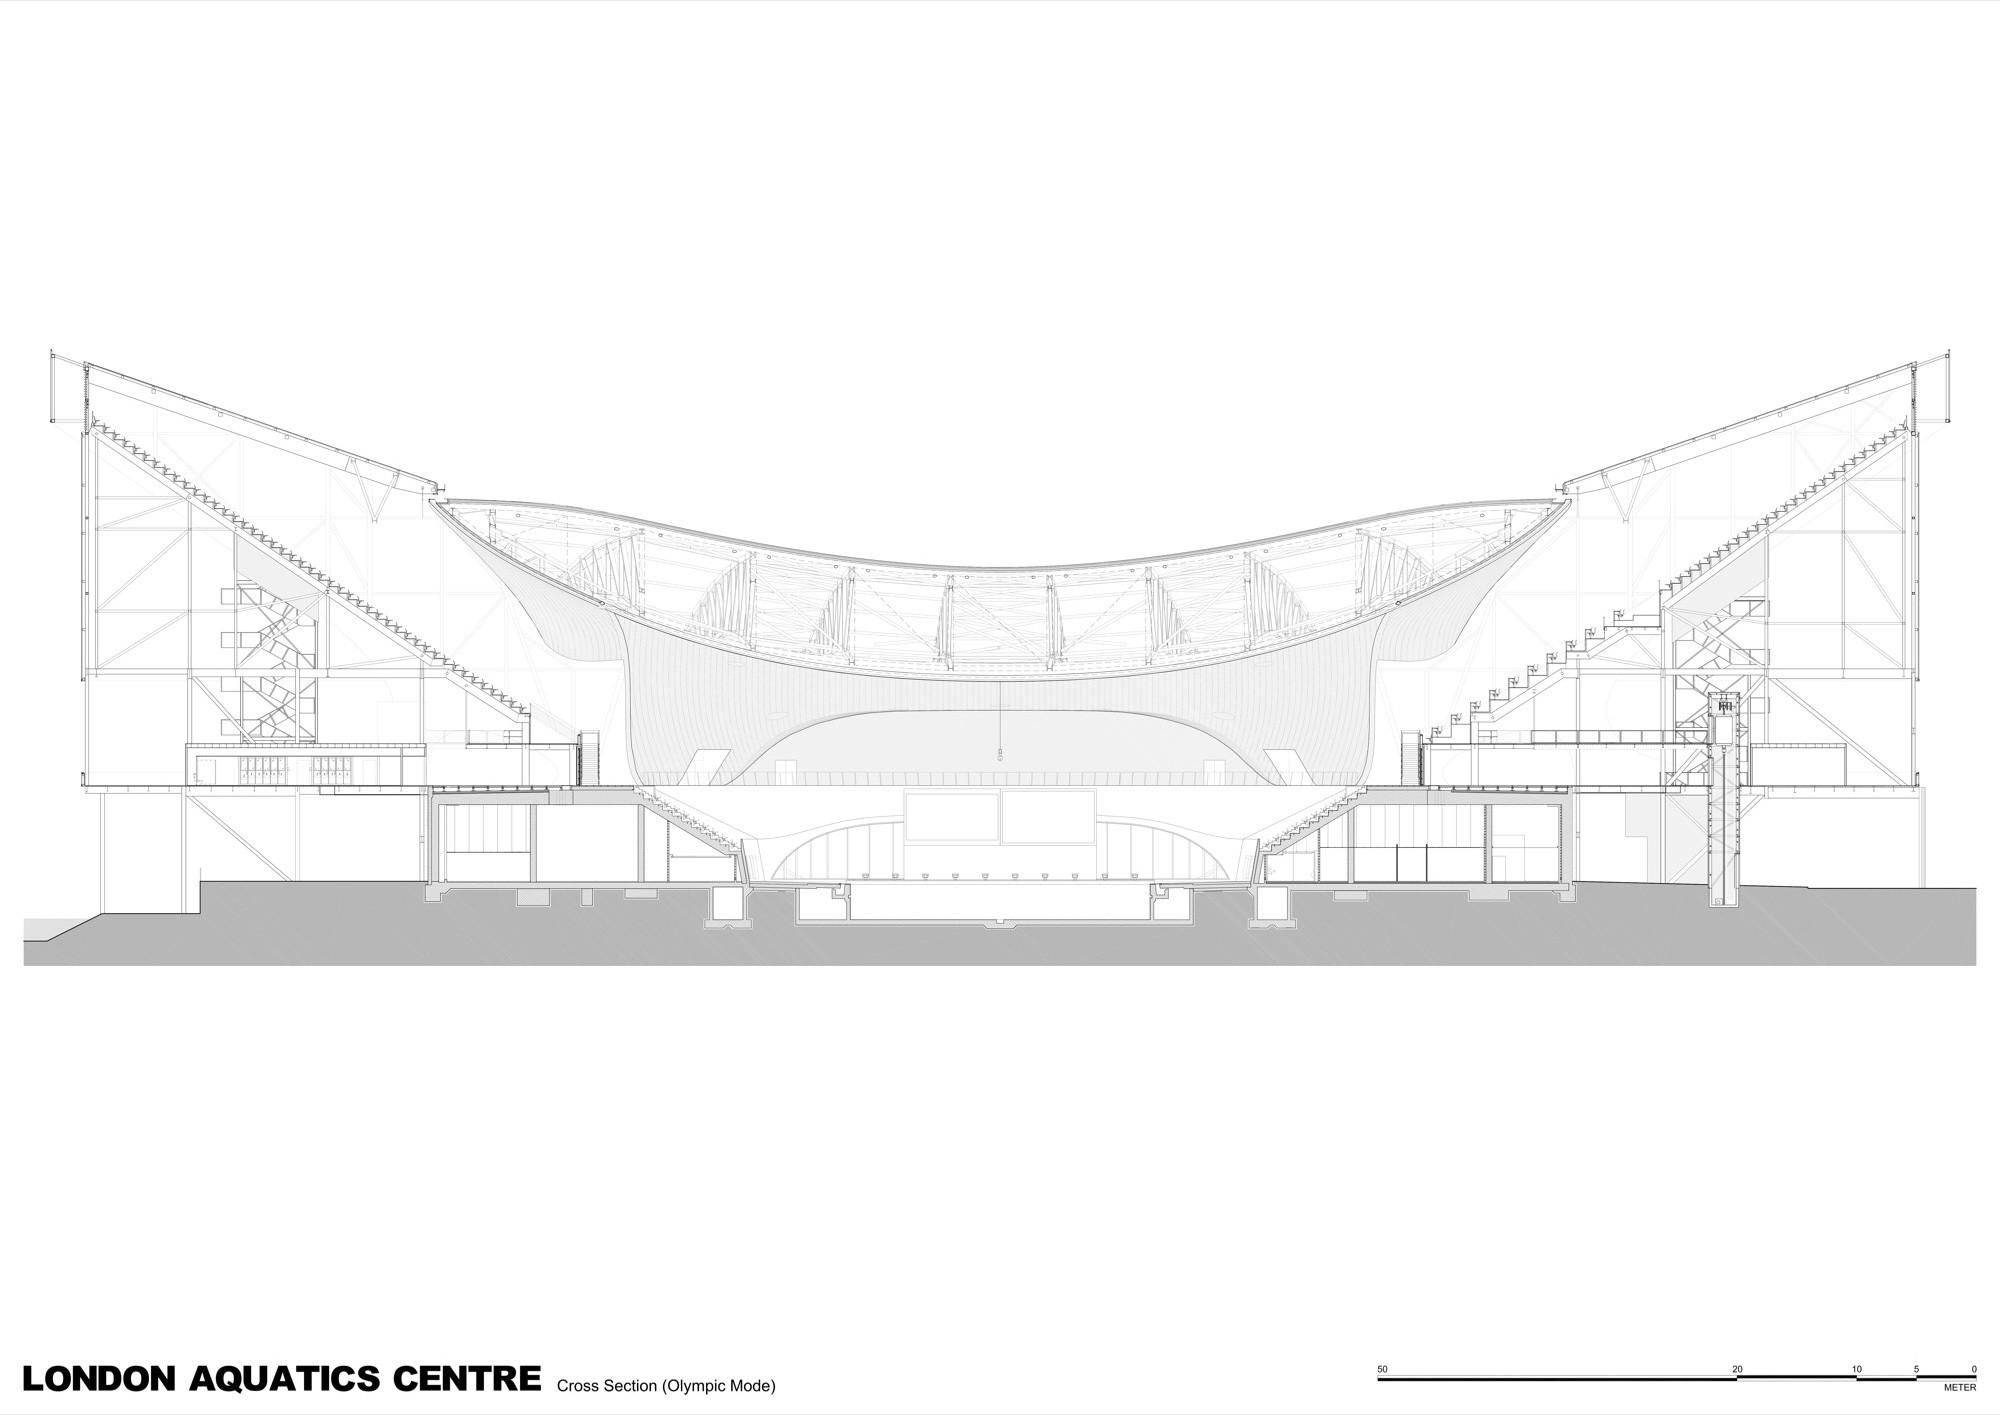 Gallery Of London Aquatics Centre For 2012 Summer Olympics